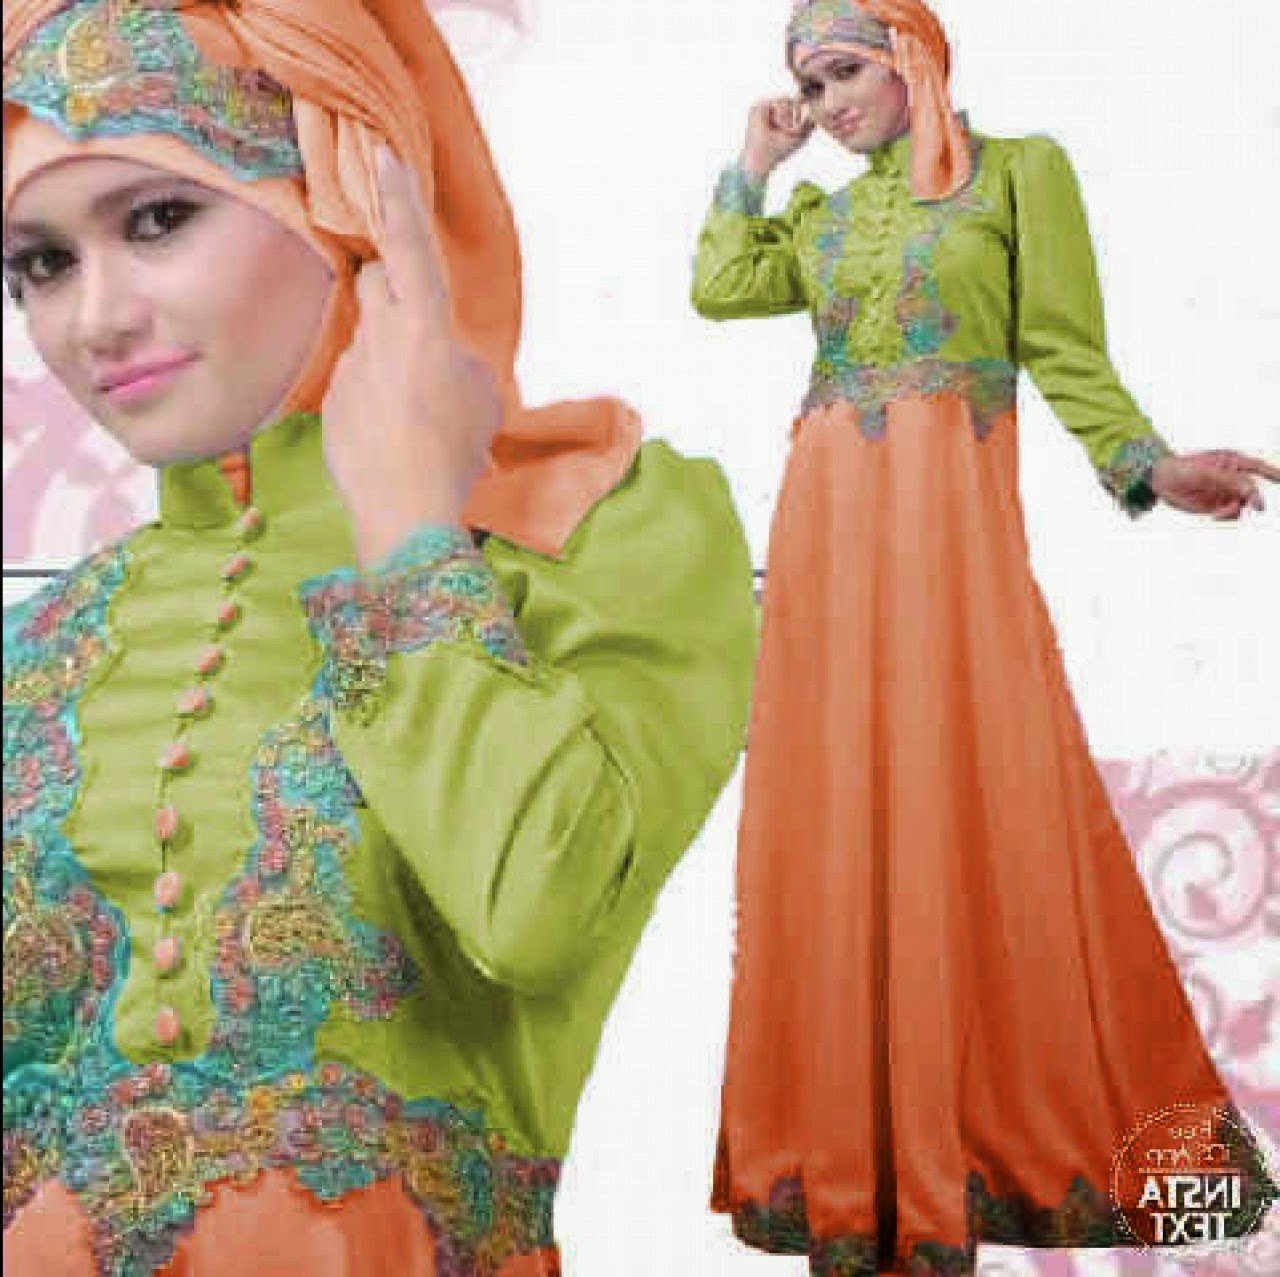 Design Model Baju Lebaran Muslim 2018 Zwd9 Kumpulan Foto Model Baju Kebaya Lebaran Terbaru 2018